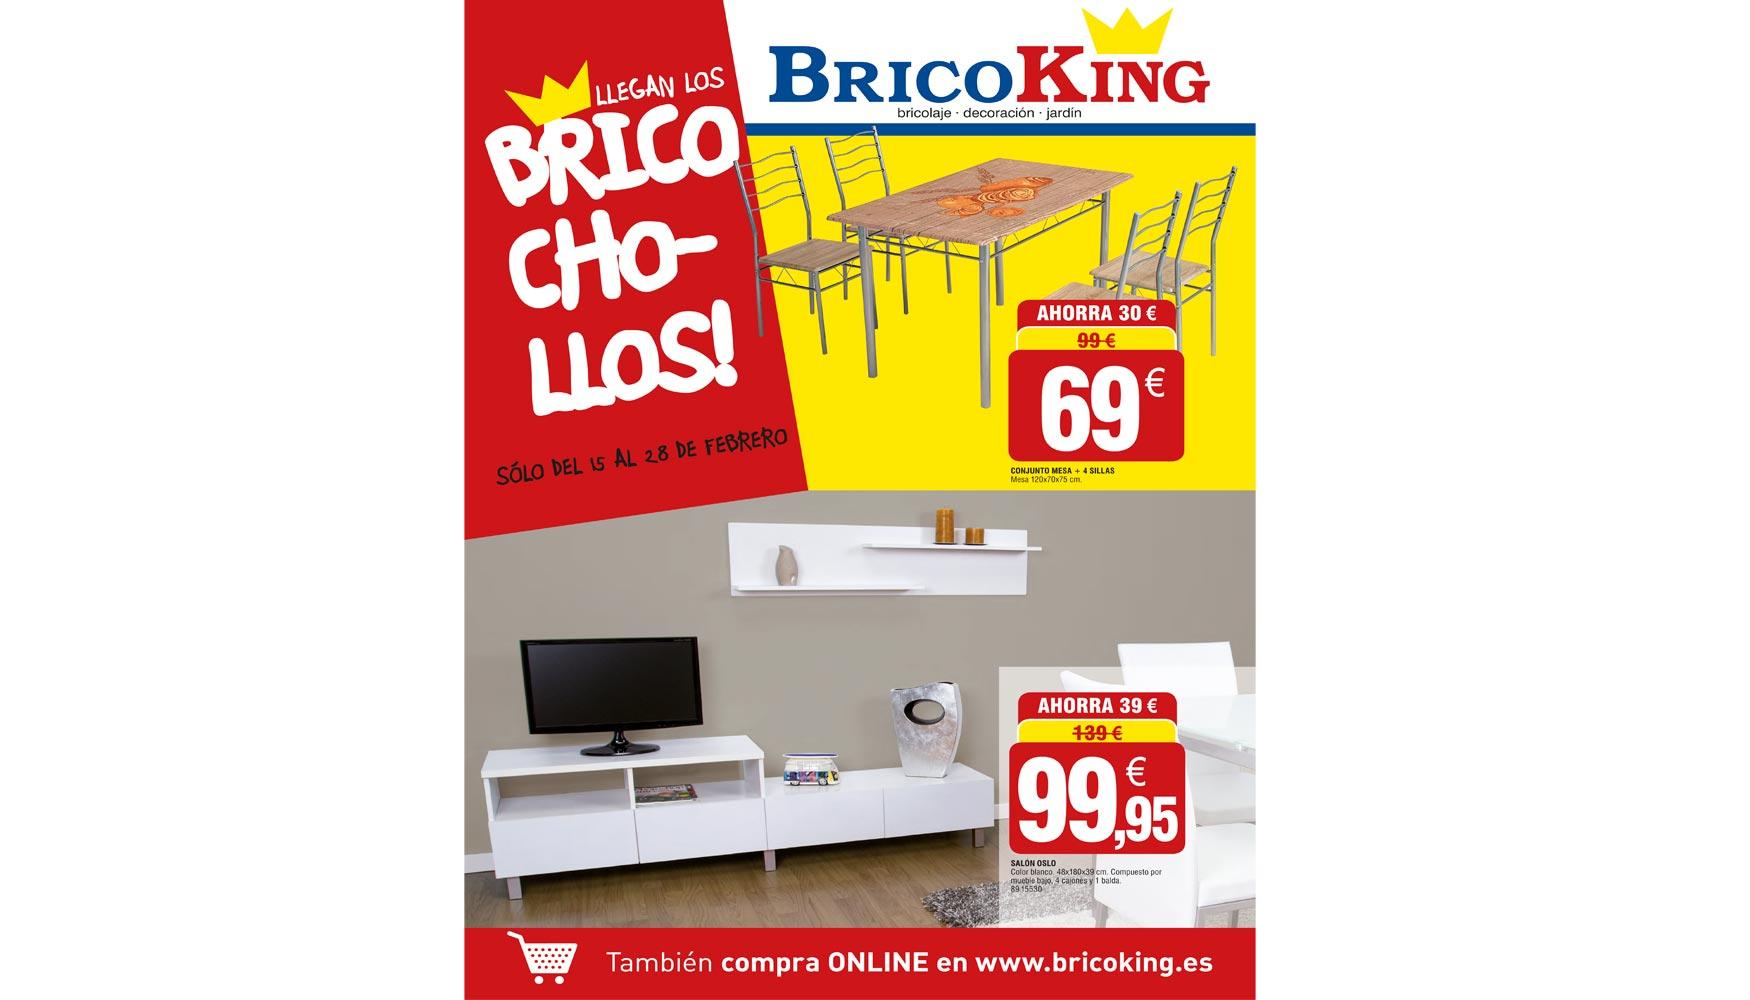 Beautiful Bricoking Lanza Su Nuevo Folleto U0027Brico Chollosu0027